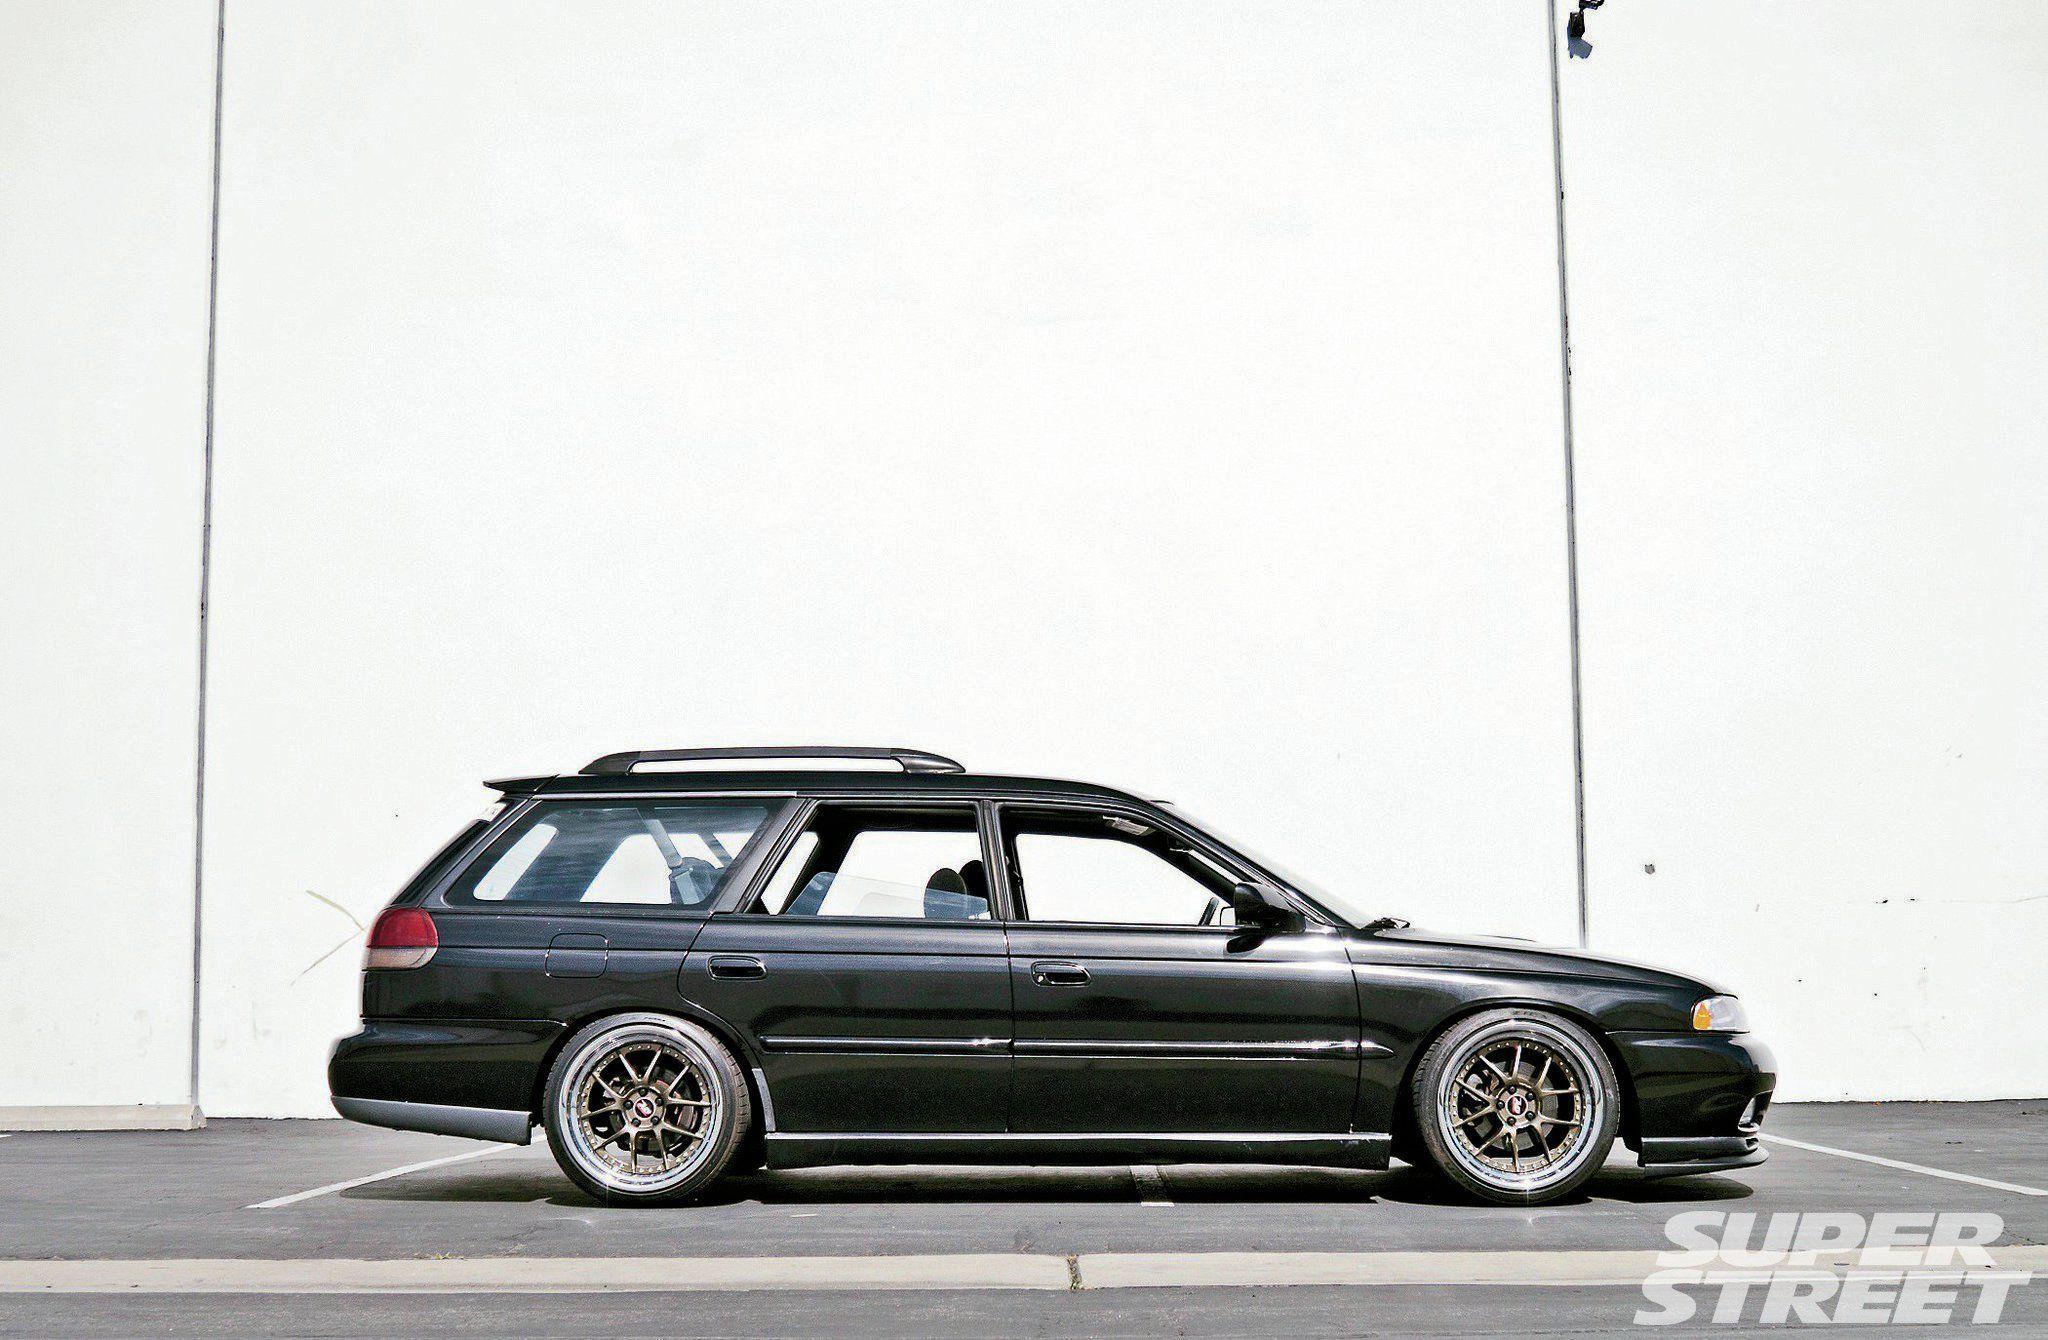 We take Import Tuner's old 1998 Subaru Legacy GT Wagon